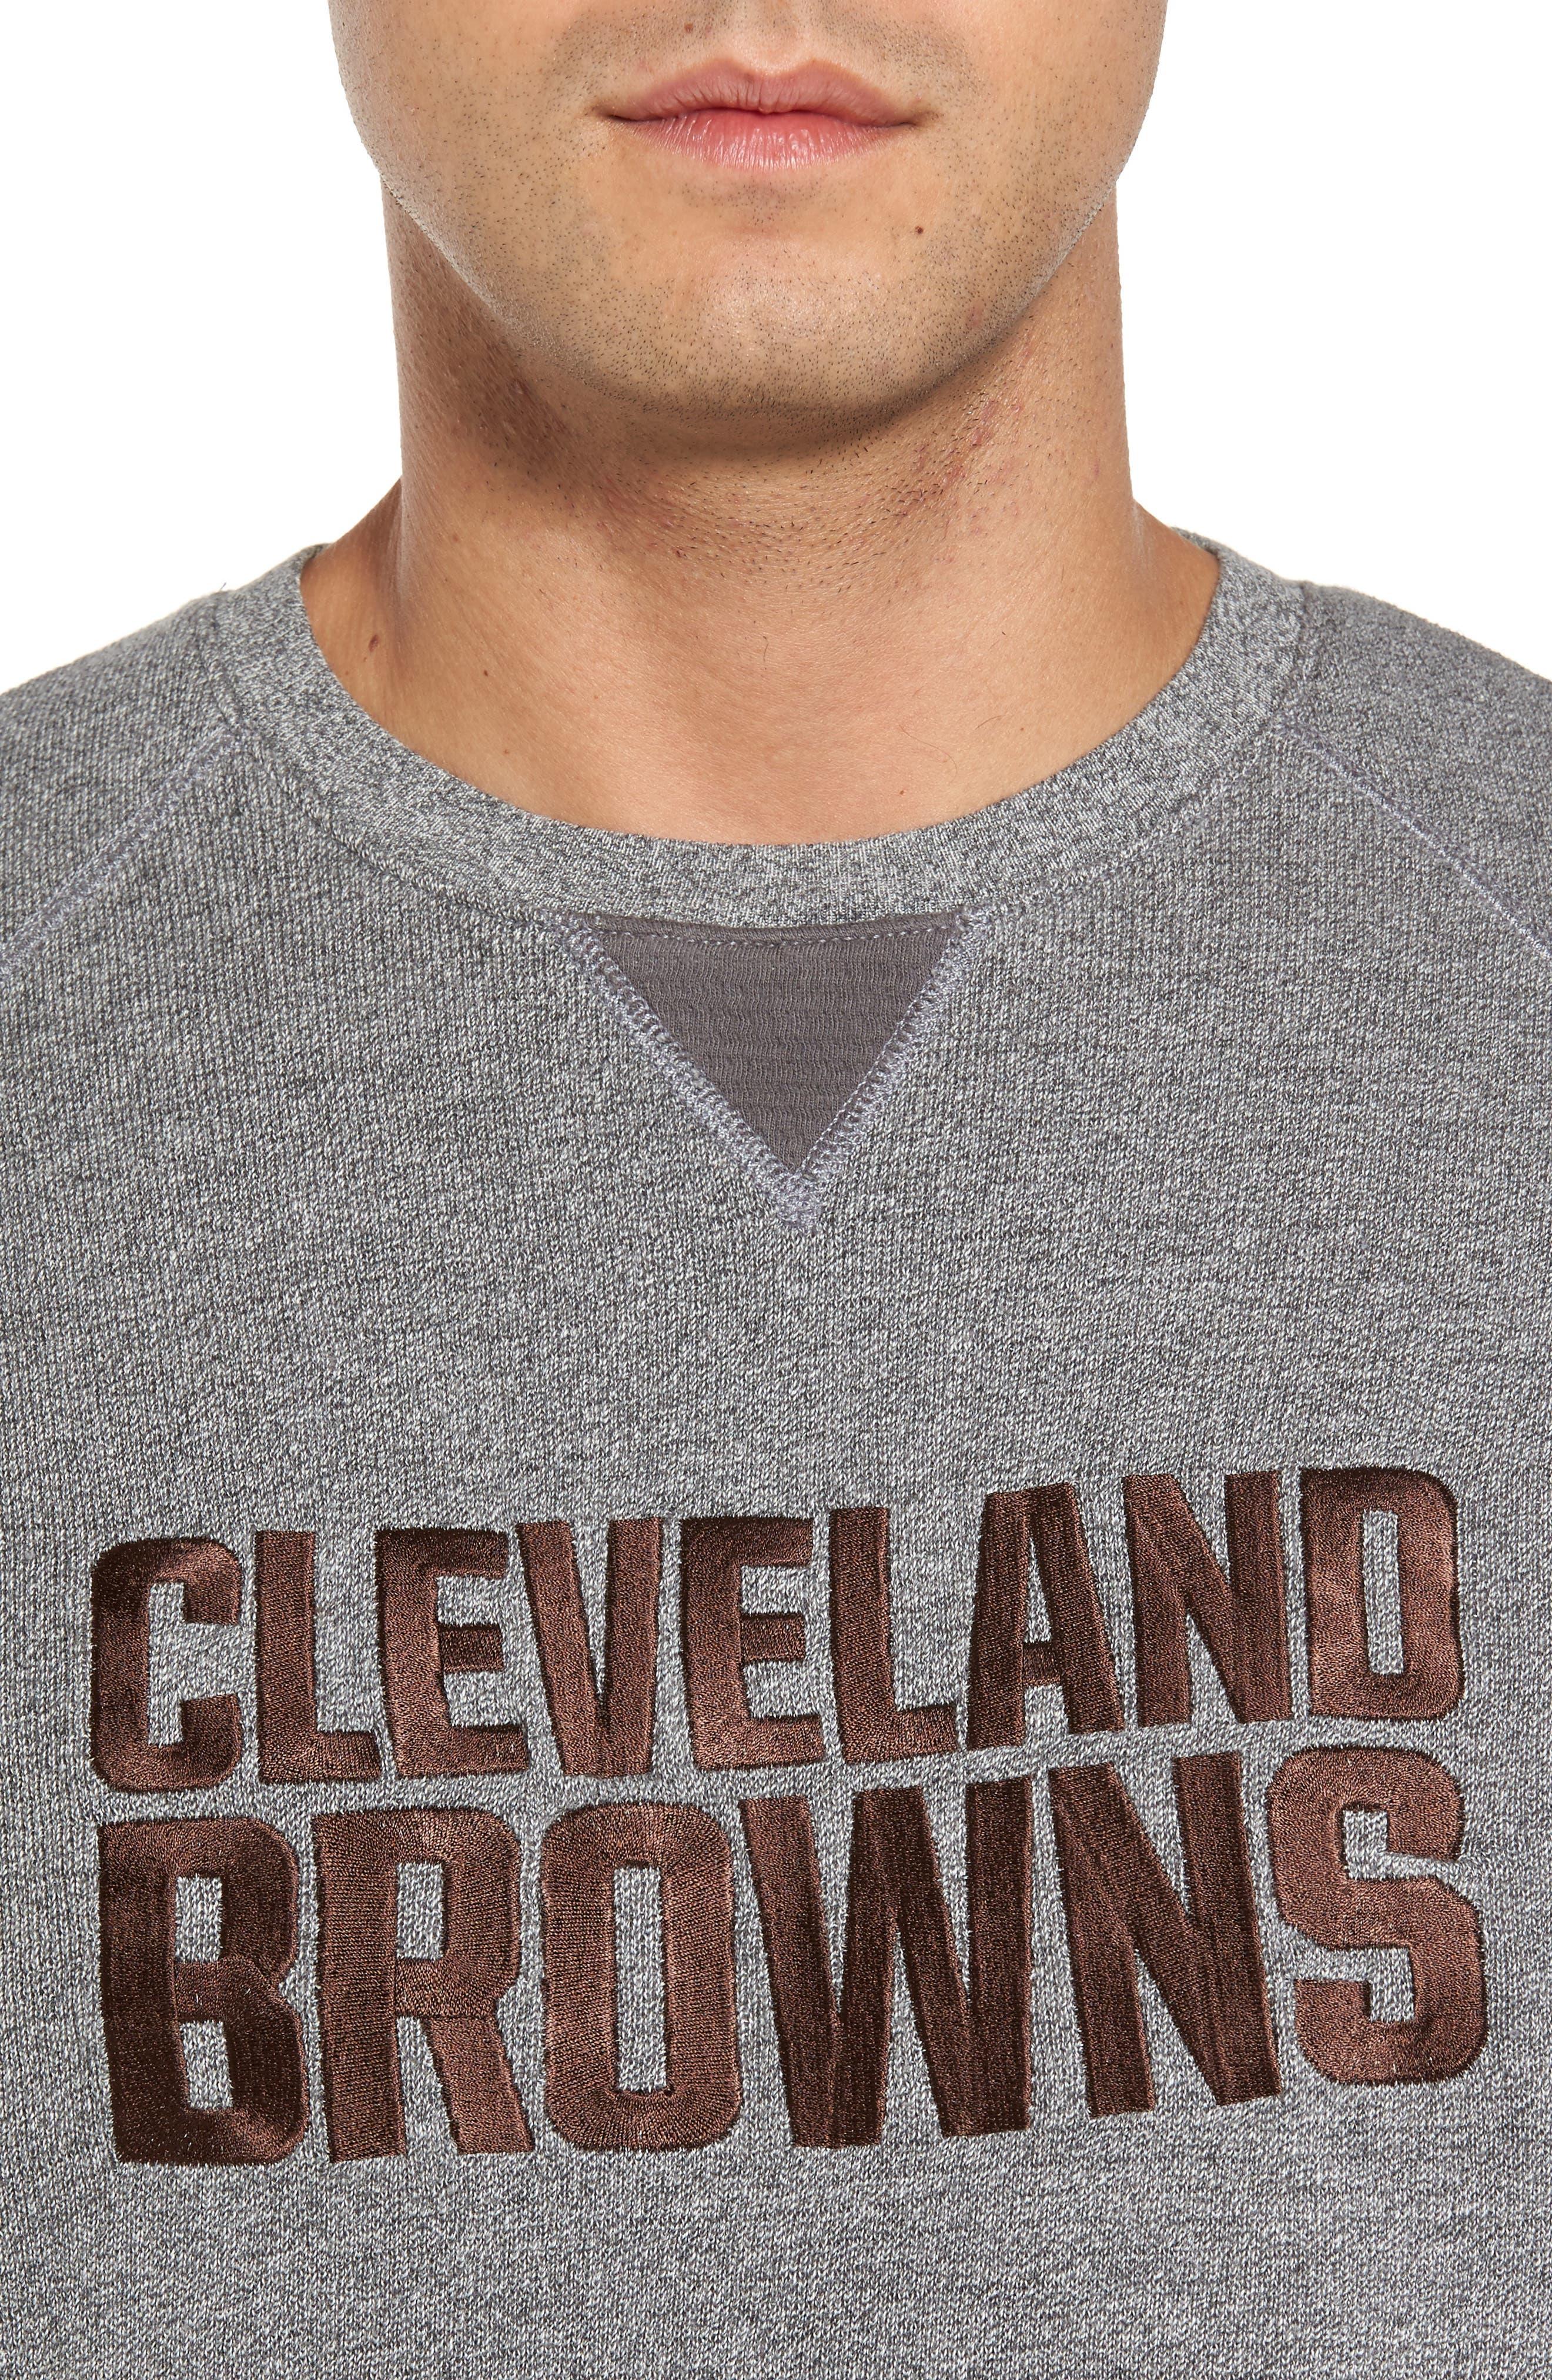 NFL Stitch of Liberty Embroidered Crewneck Sweatshirt,                             Alternate thumbnail 99, color,